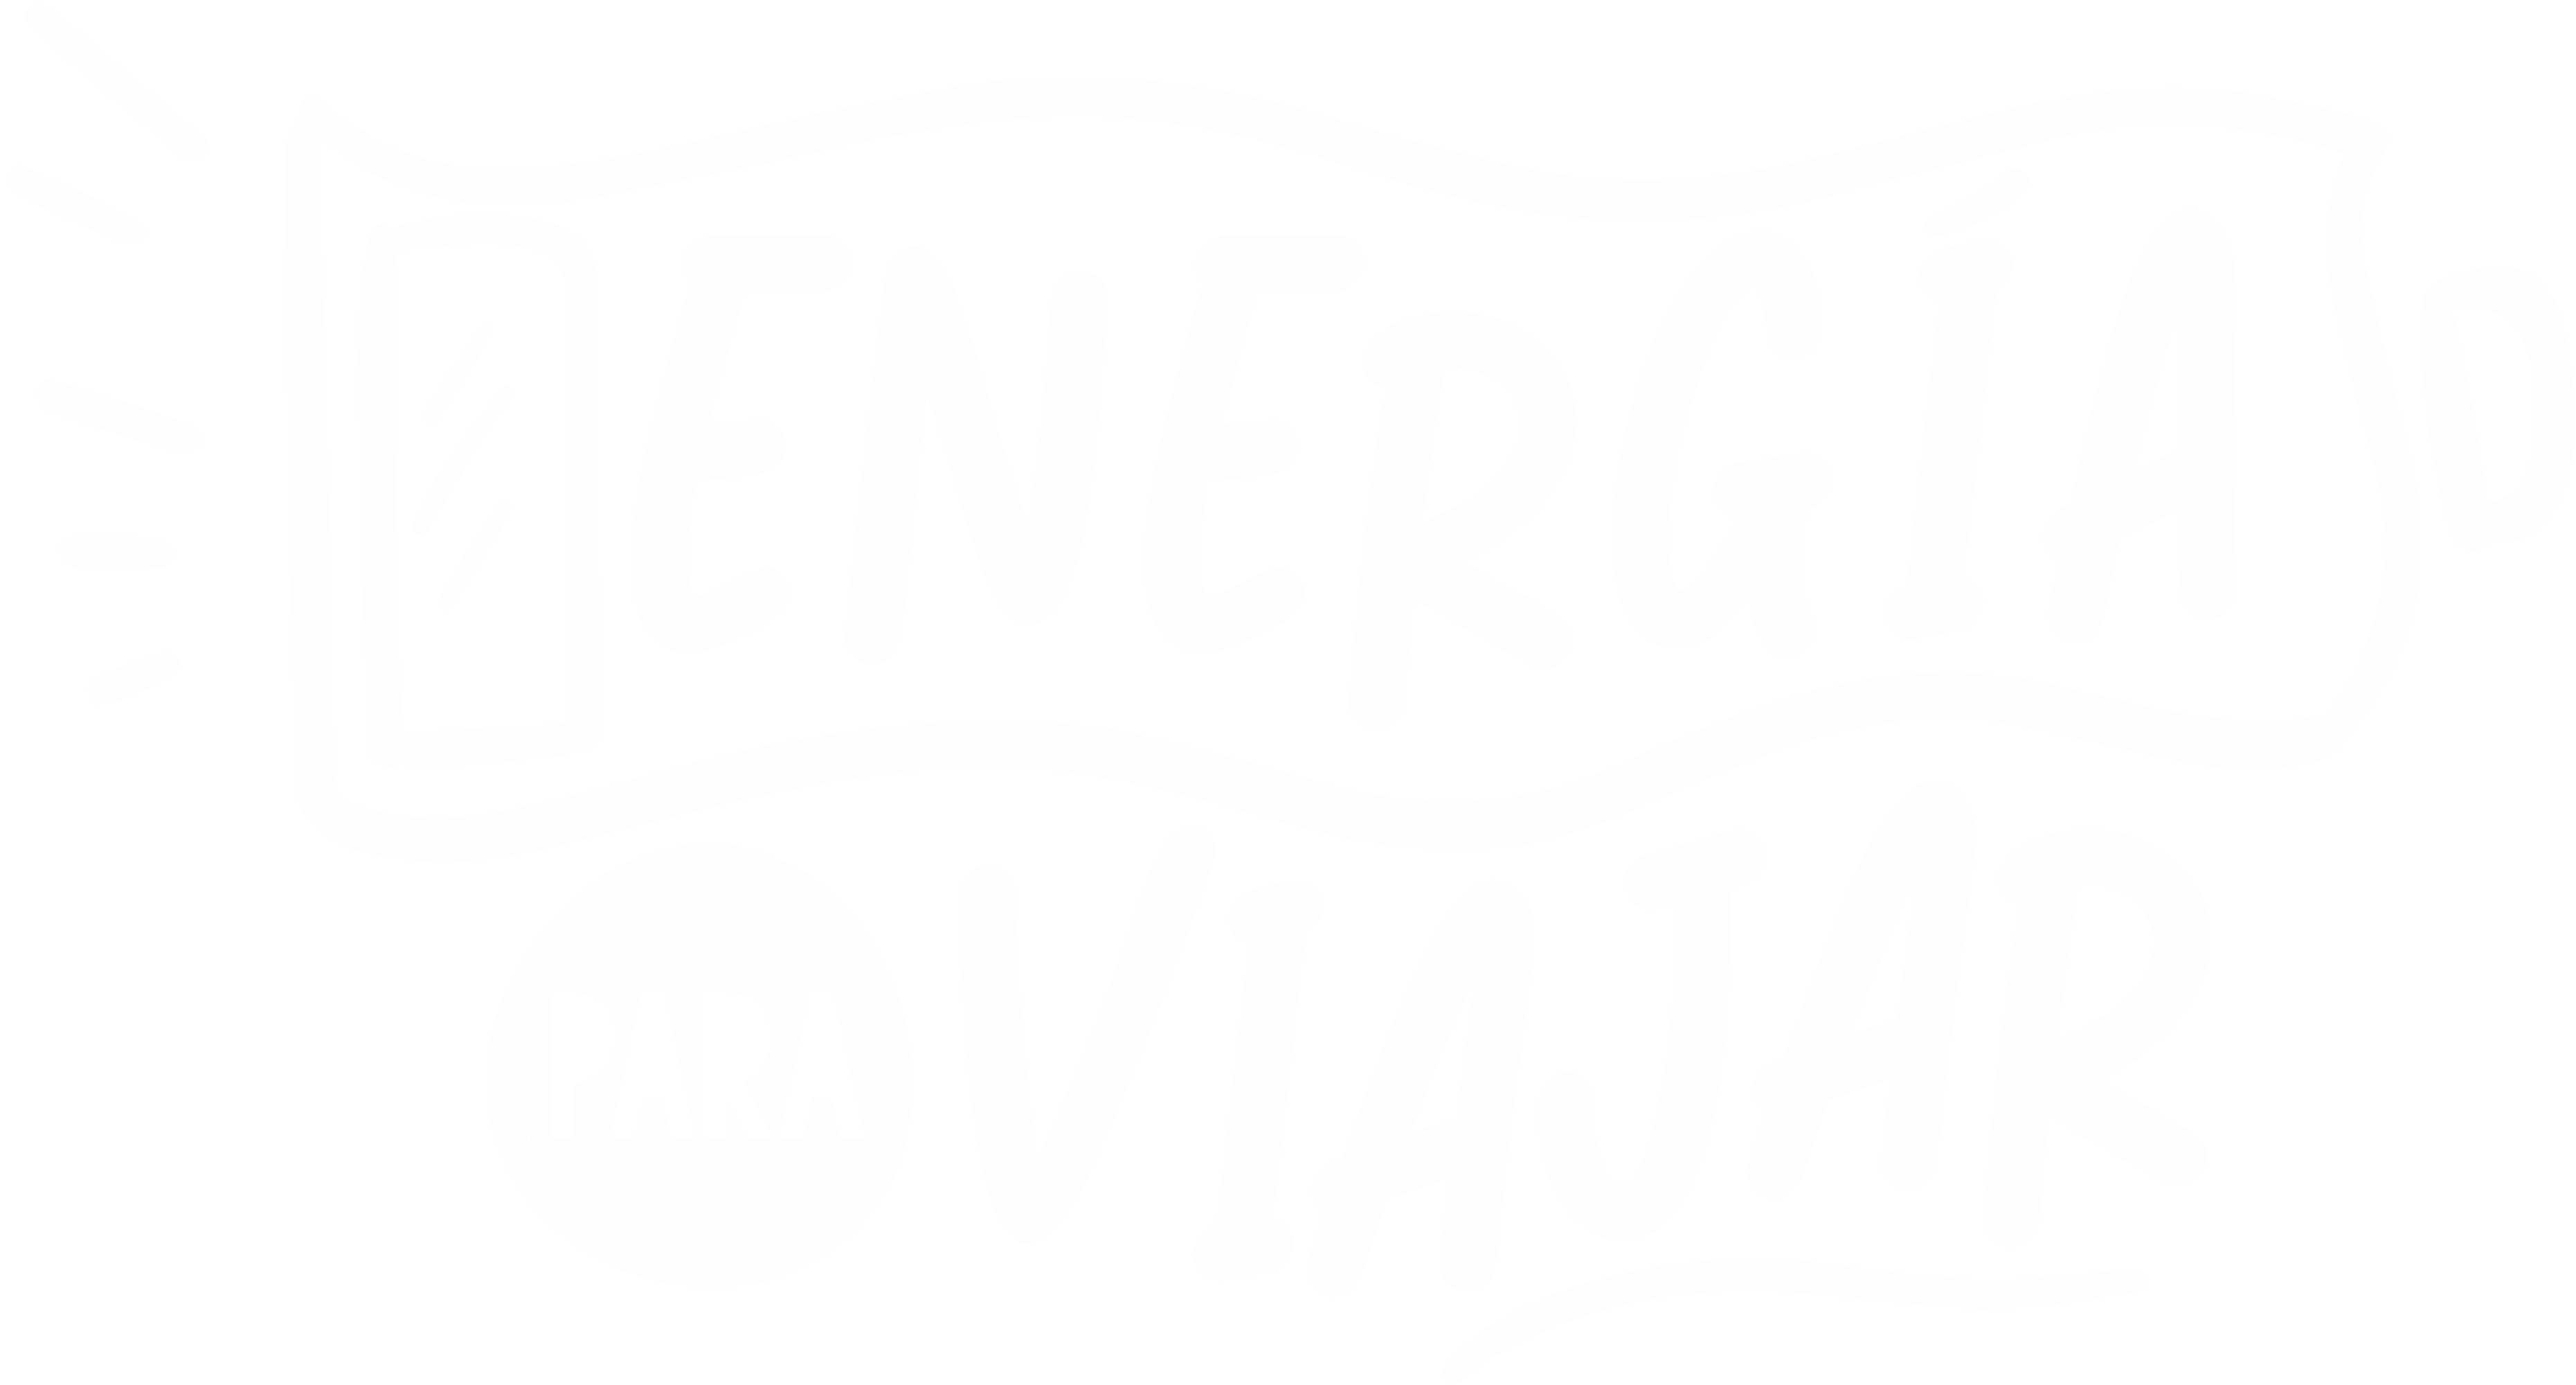 imagen intriper logo campana california almonds